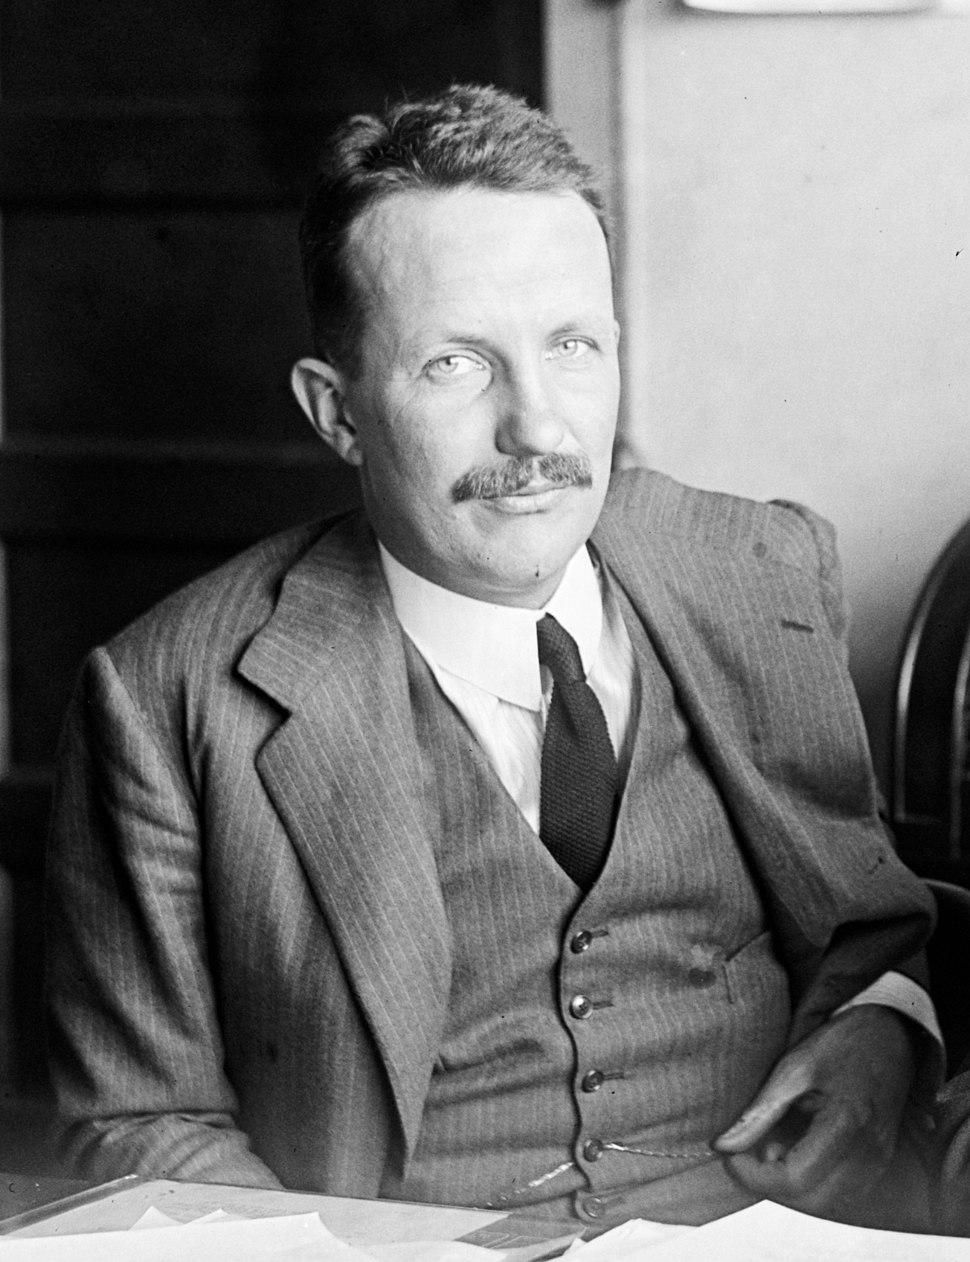 Kermit Roosevelt 1926